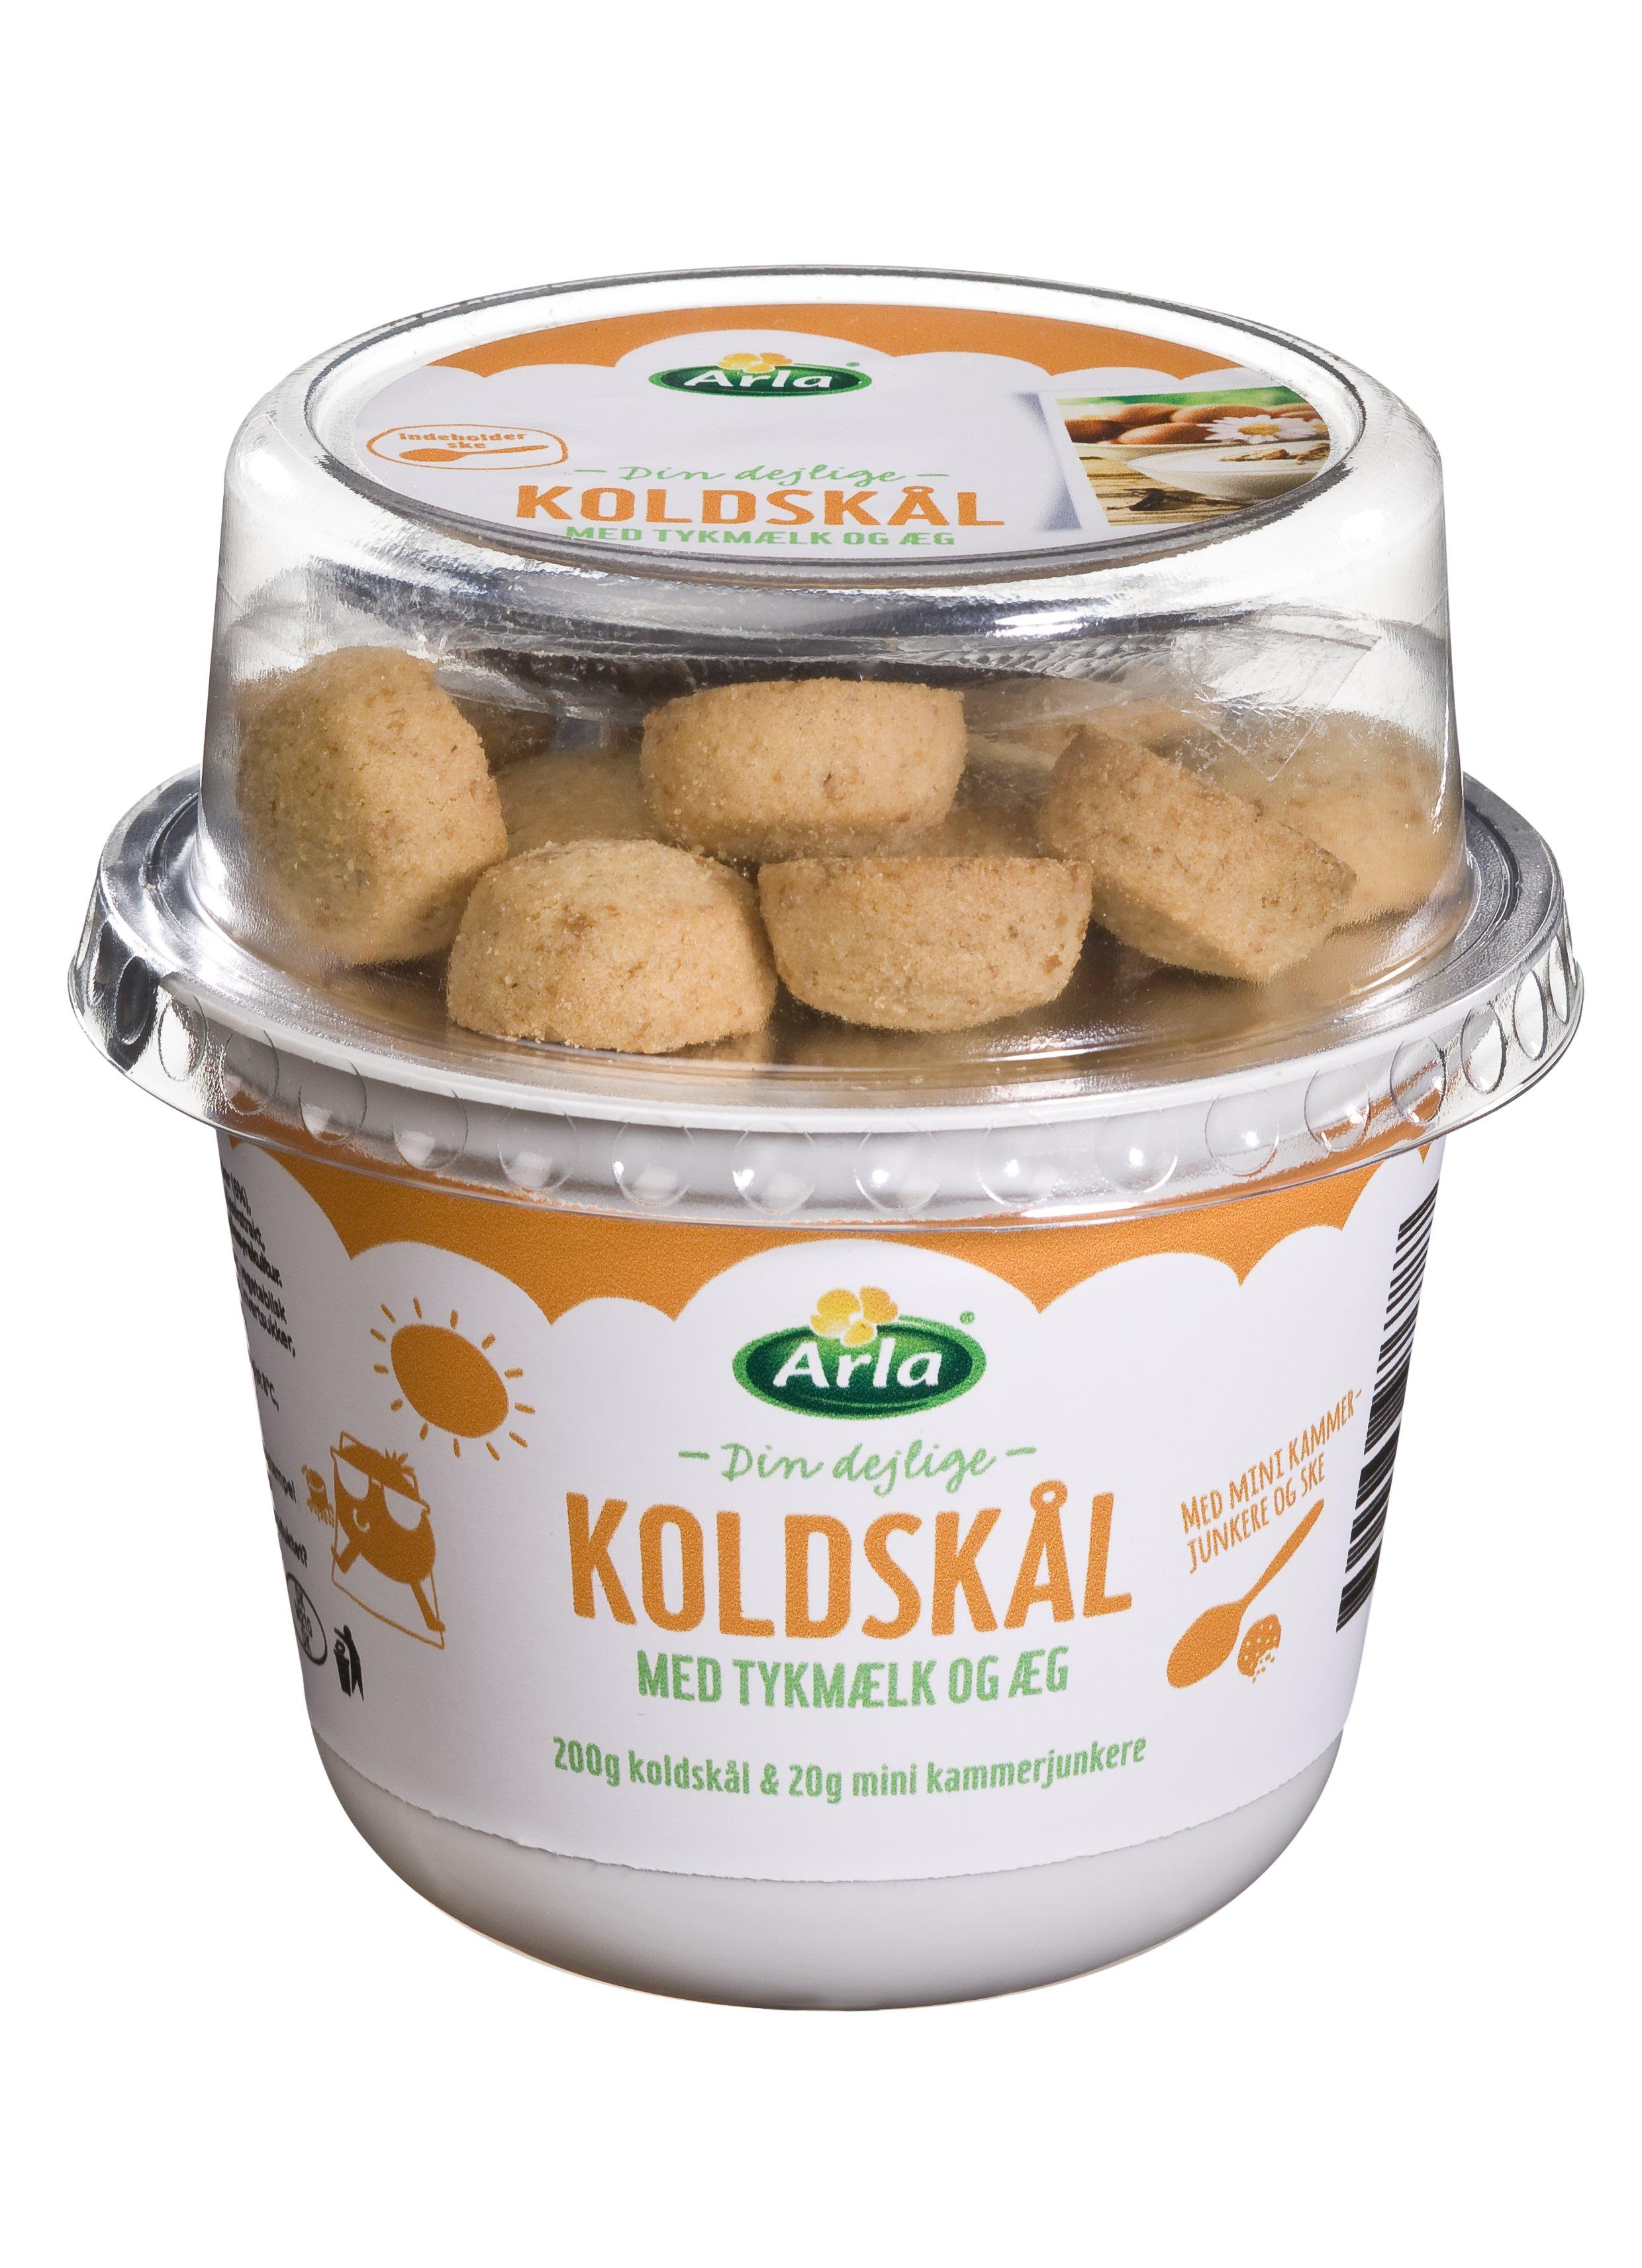 Koldskål tykmælk/æg & kammerjunker 4,2%